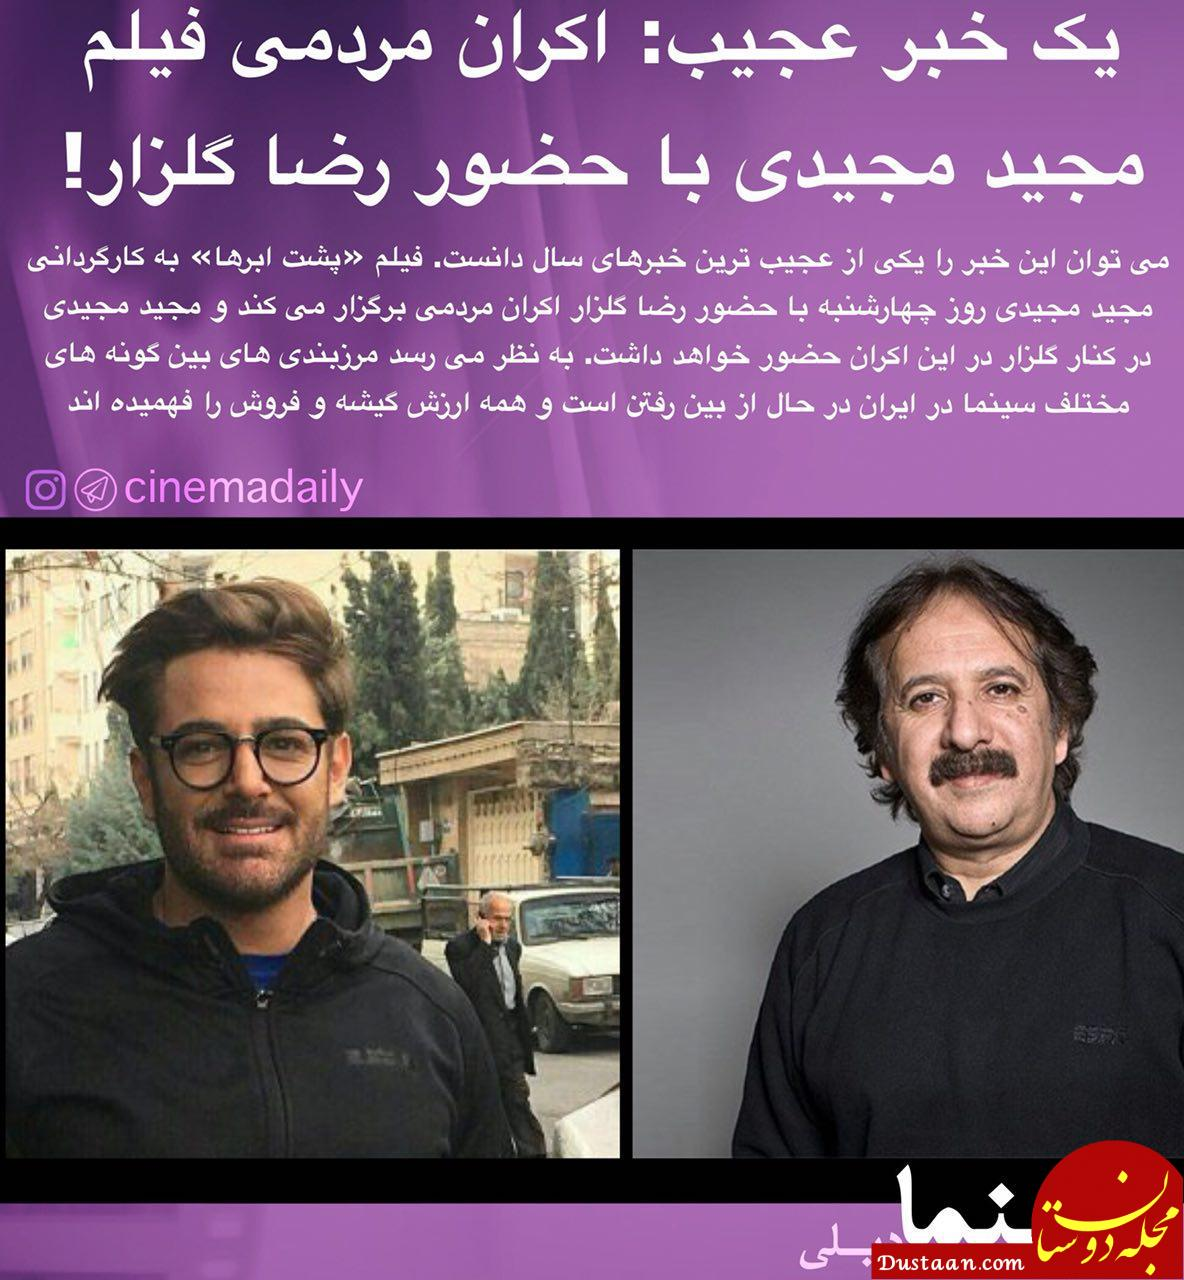 www.dustaan.com اکران مردمی فیلم مجید مجیدی با حضور رضا گلزار! +عکس